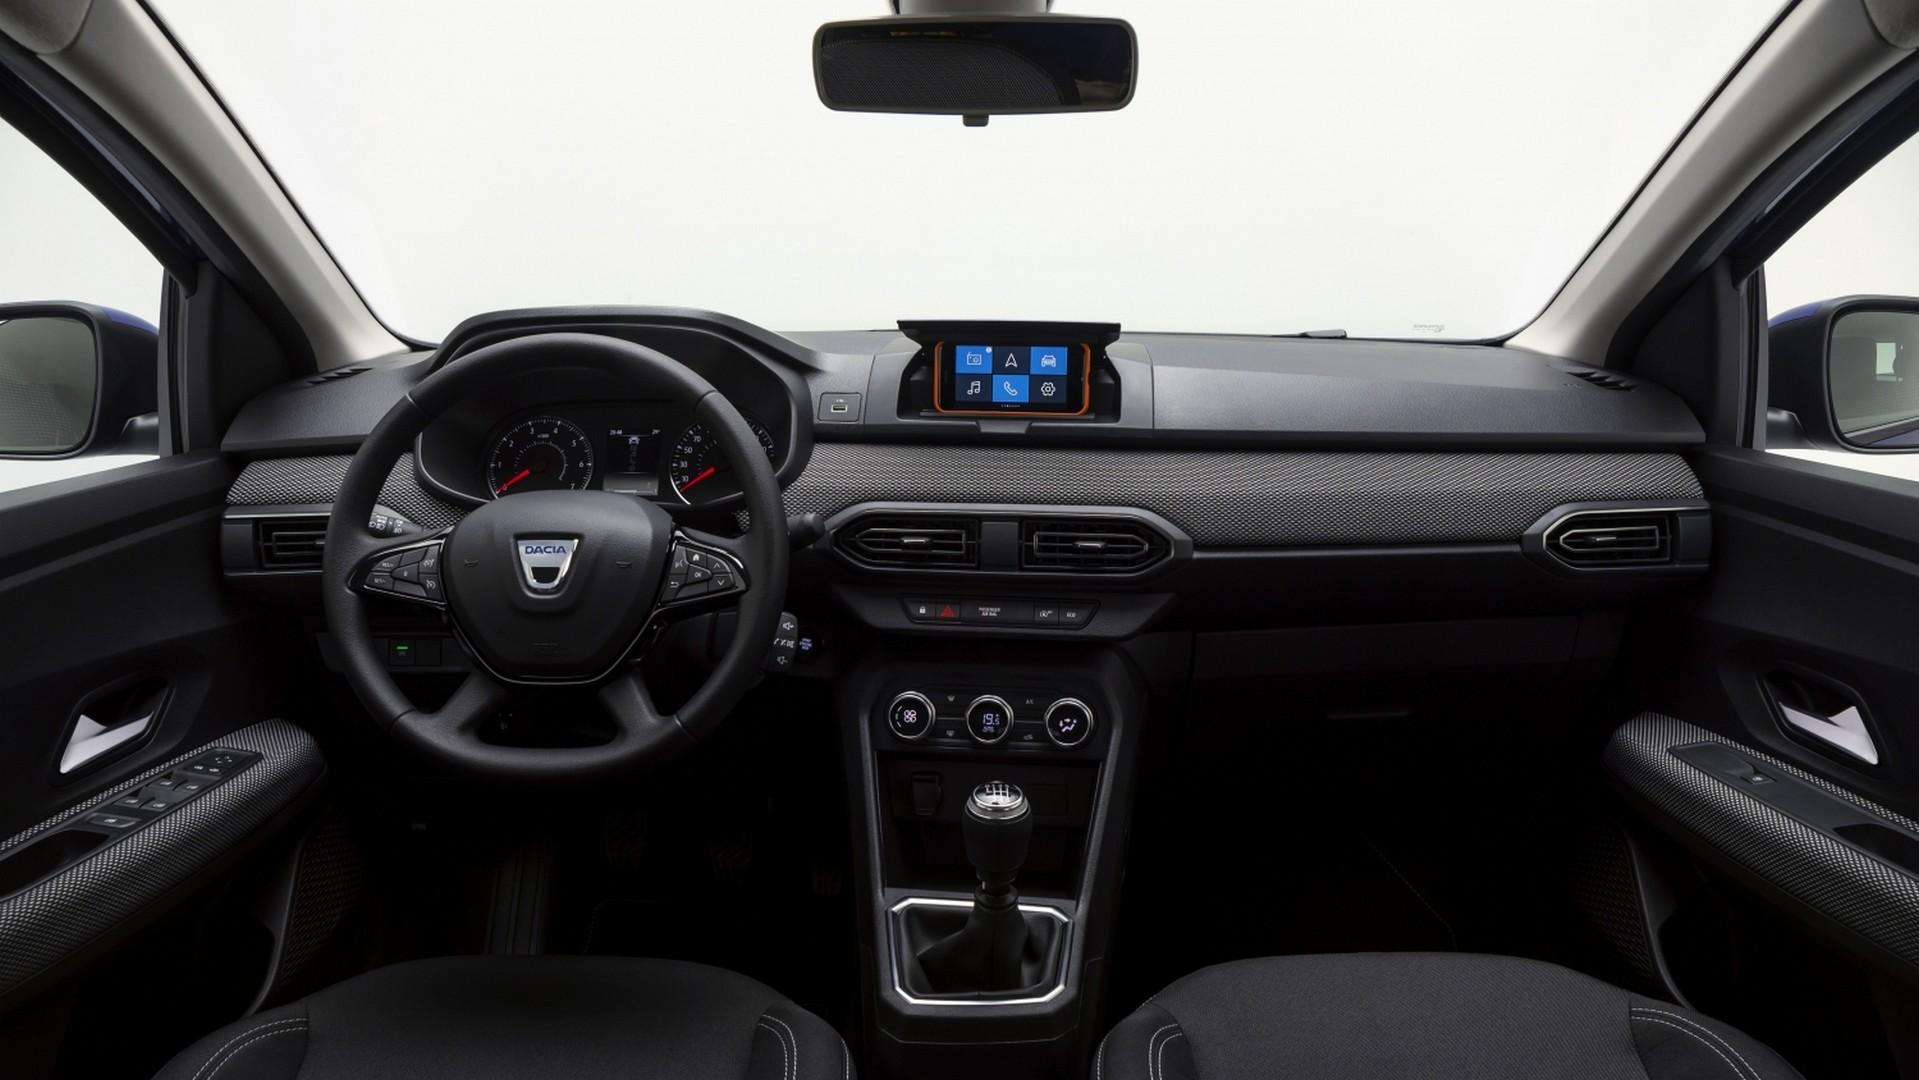 Dacia Sandero 3 поколения